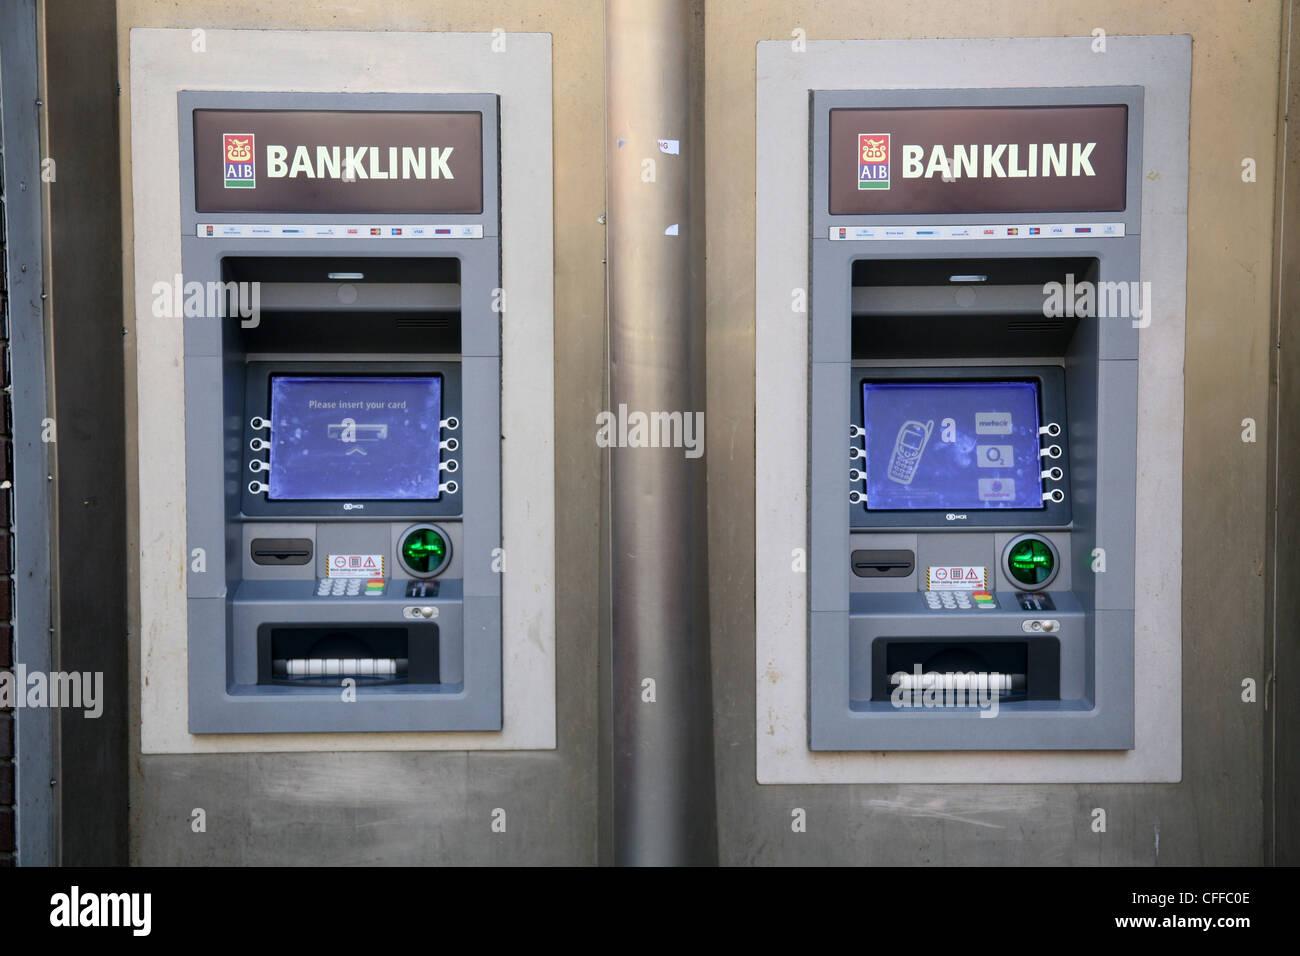 Aib Banklink Atm Machines In Temple Bar Dublin Ireland